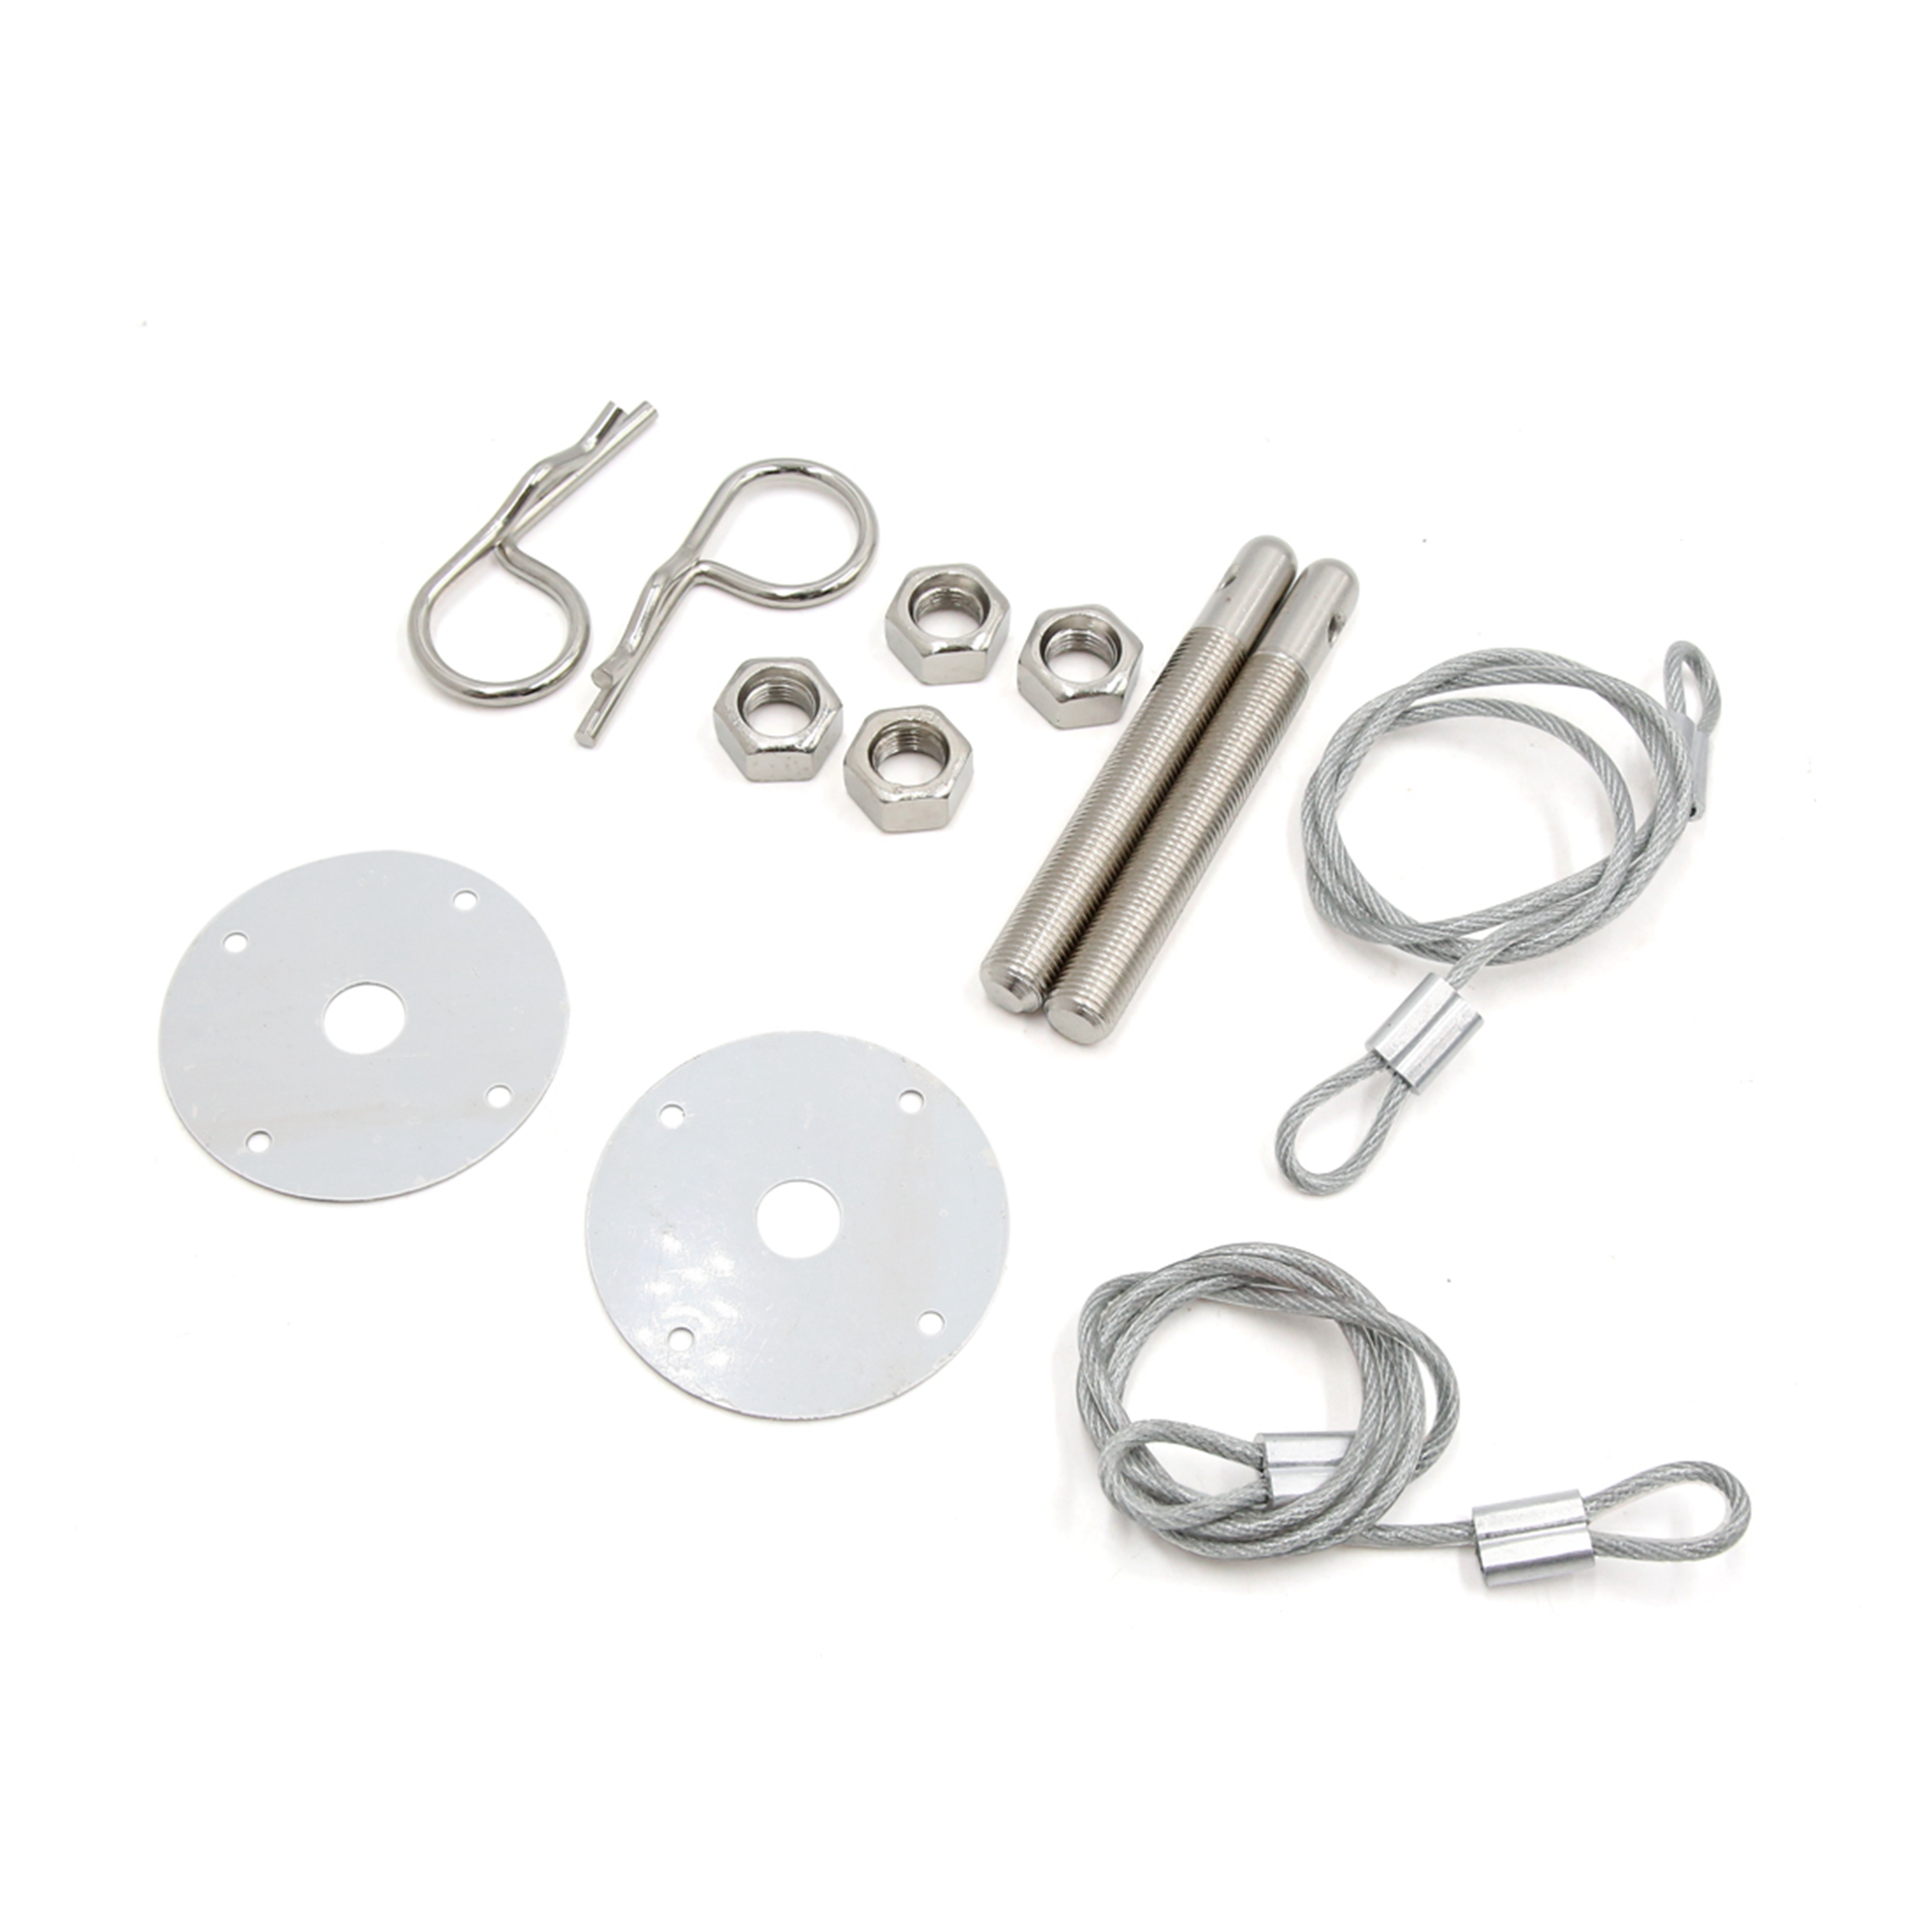 2 Pcs Racing Style Metal Mount Hood Pin Pins Plate Bonnet Lock Kit for Car